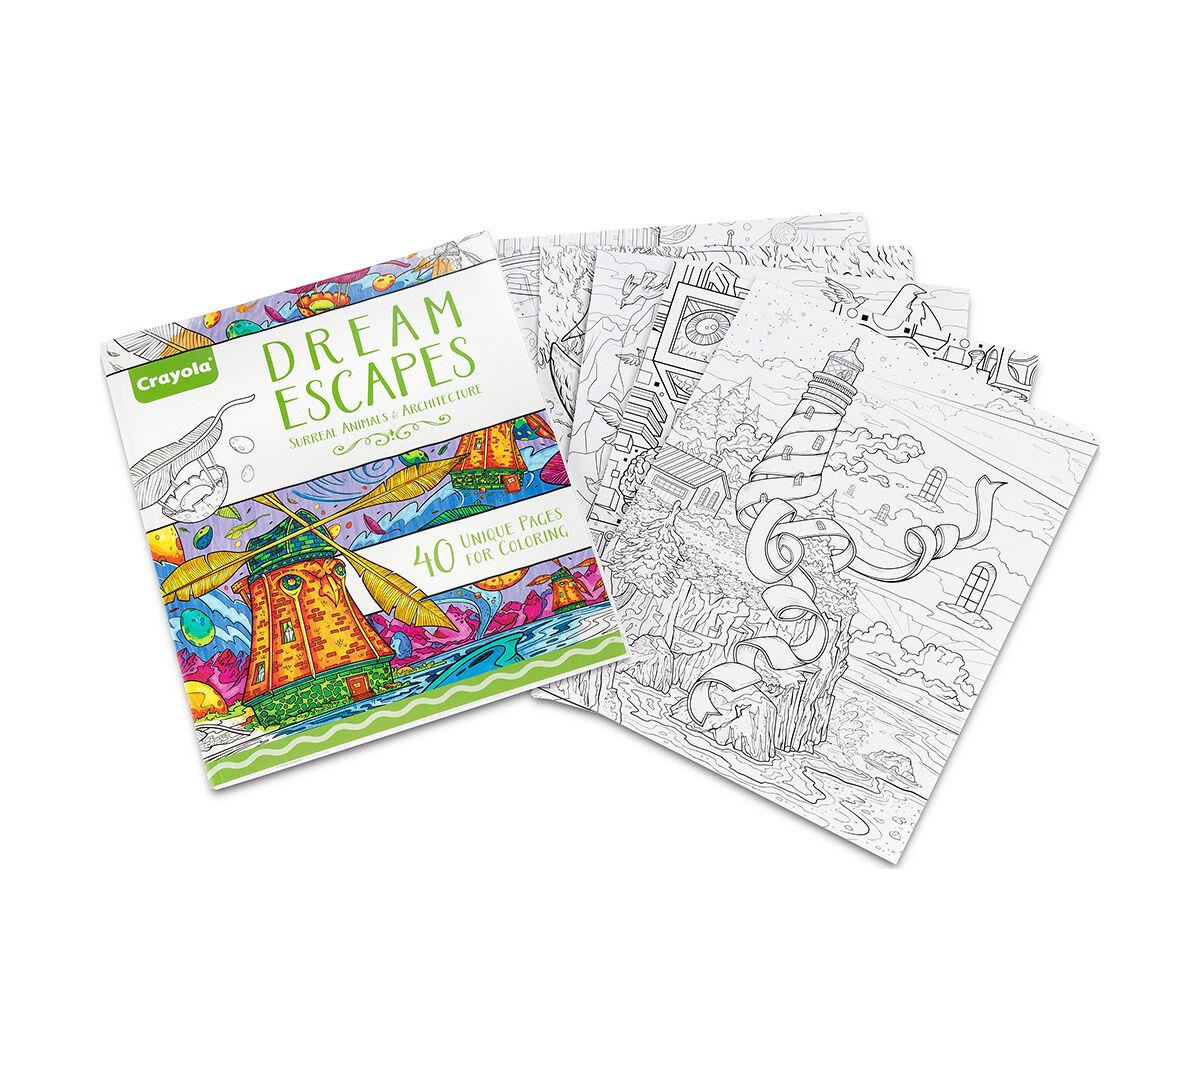 Crayola Dream Escapes Adult Coloring Art Activity 40